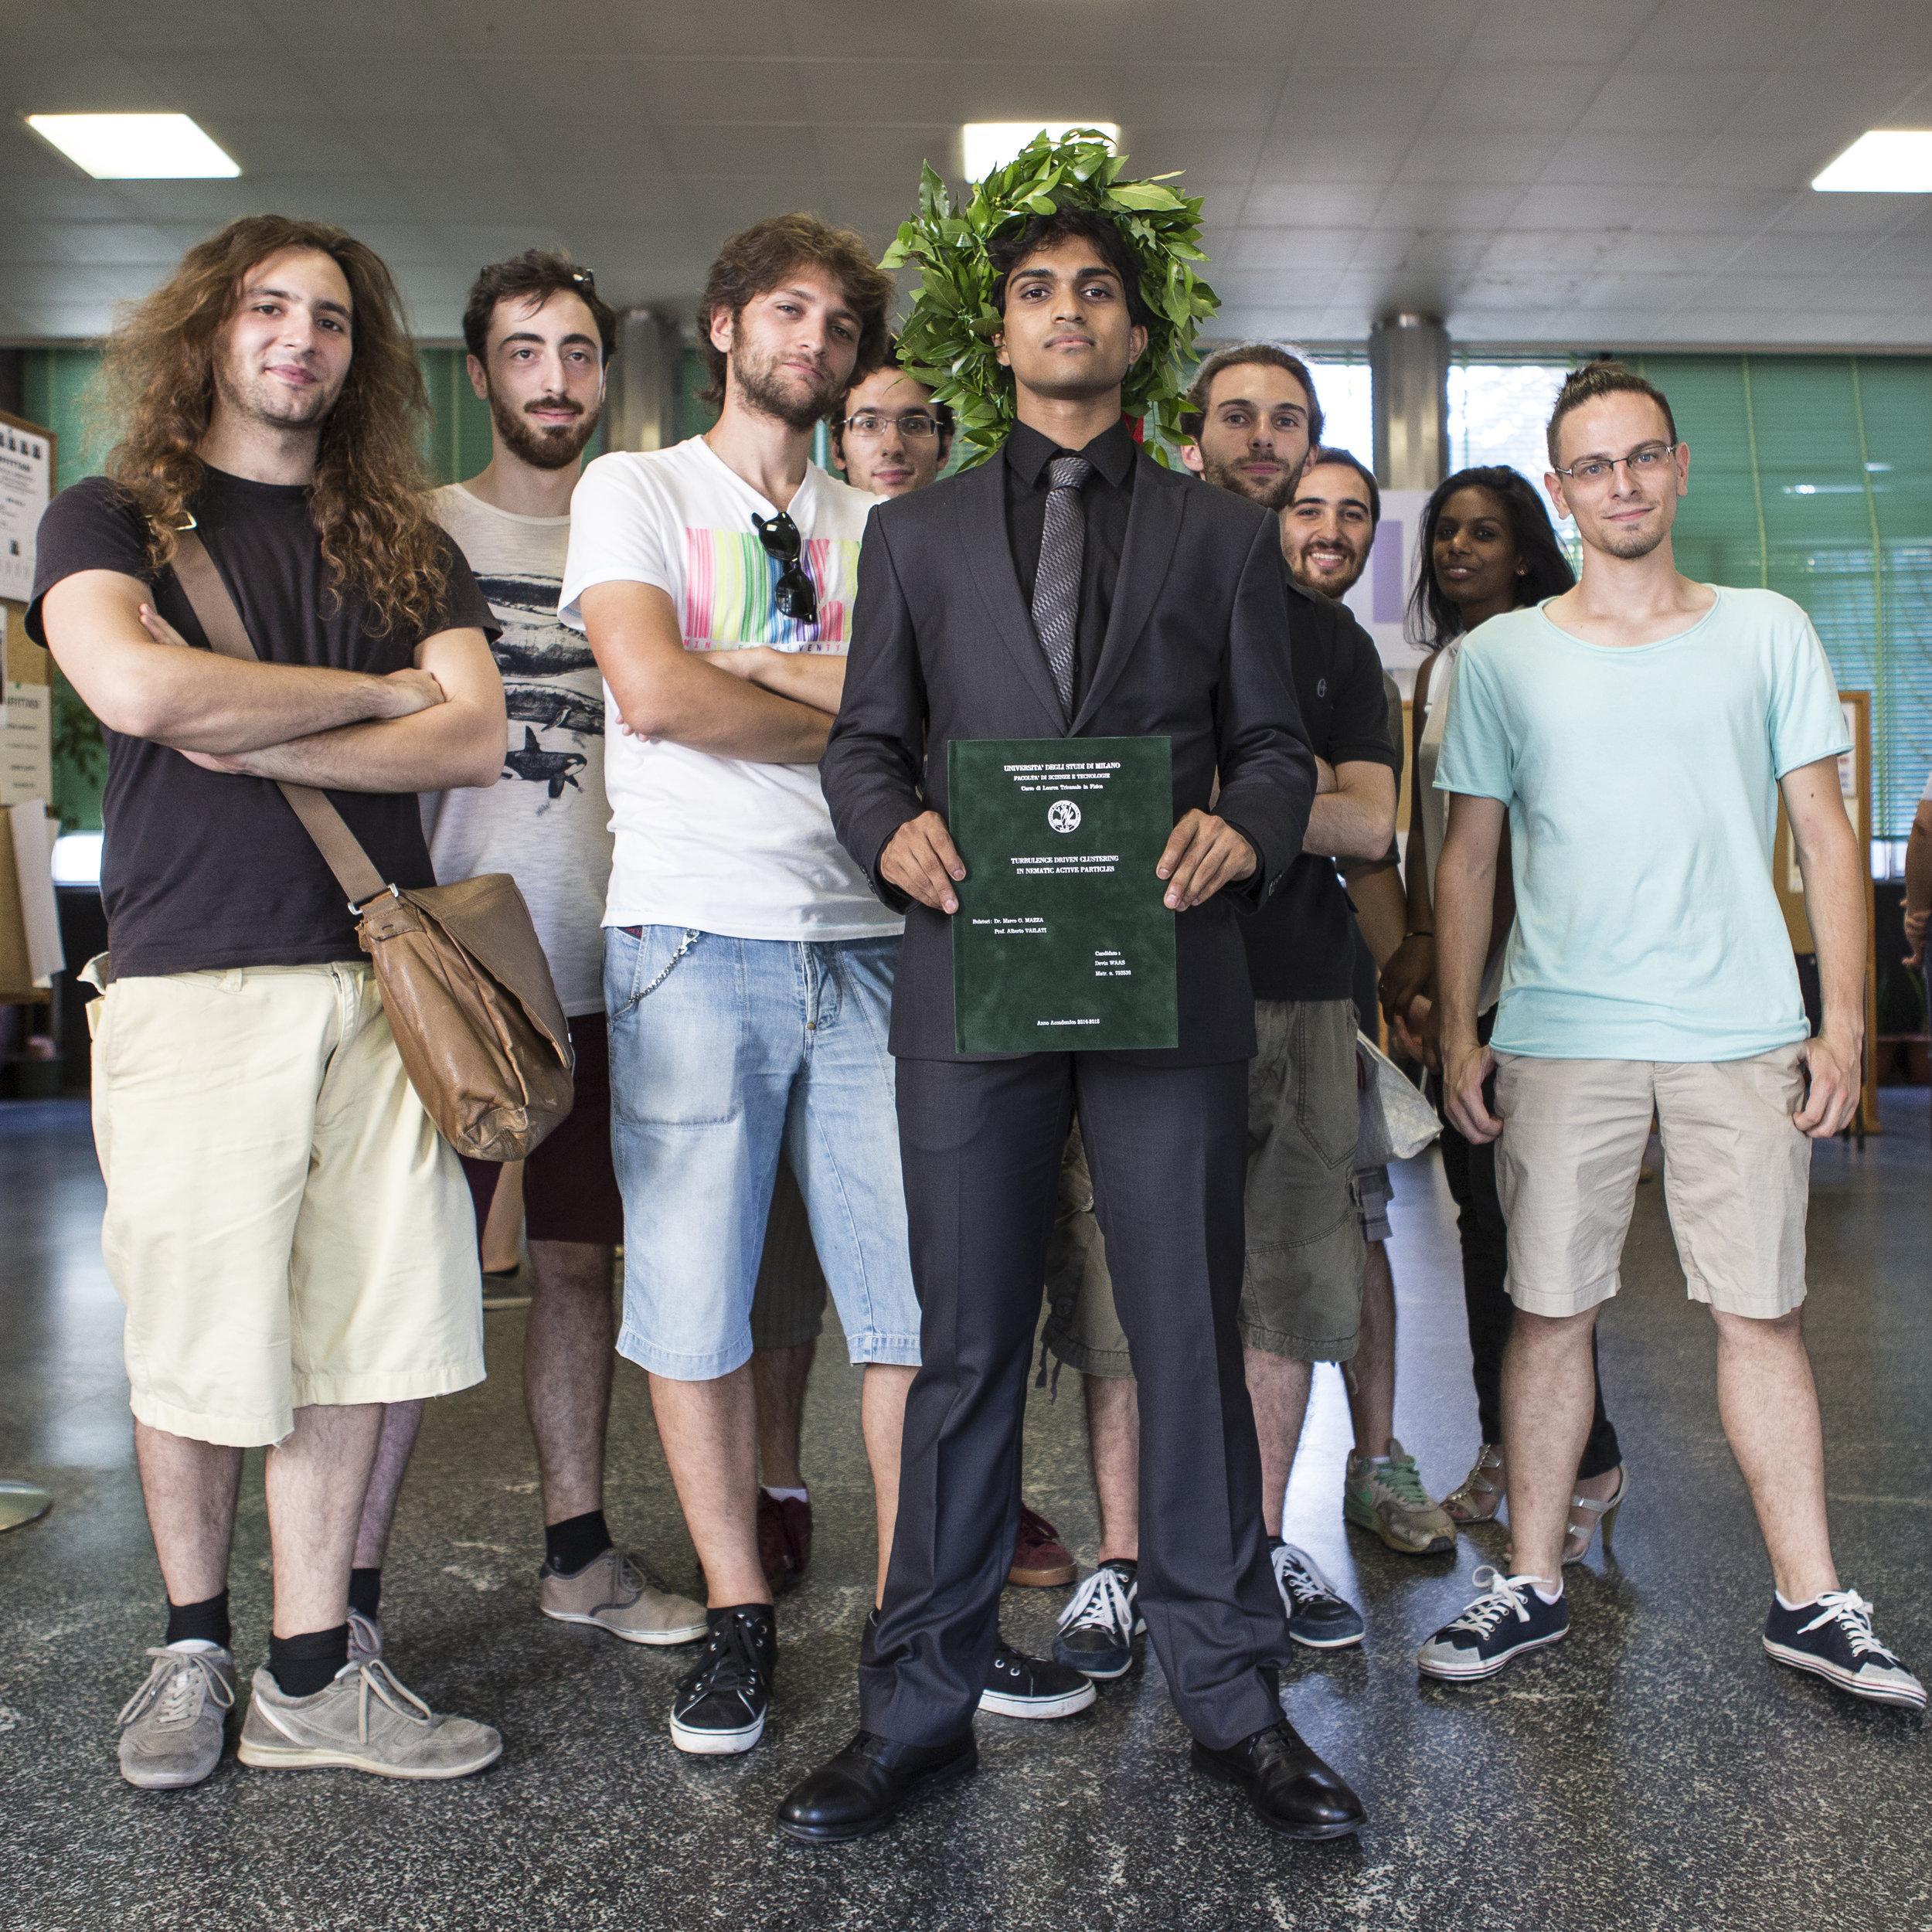 fotografo laurea foto cerimonia fotografia milano